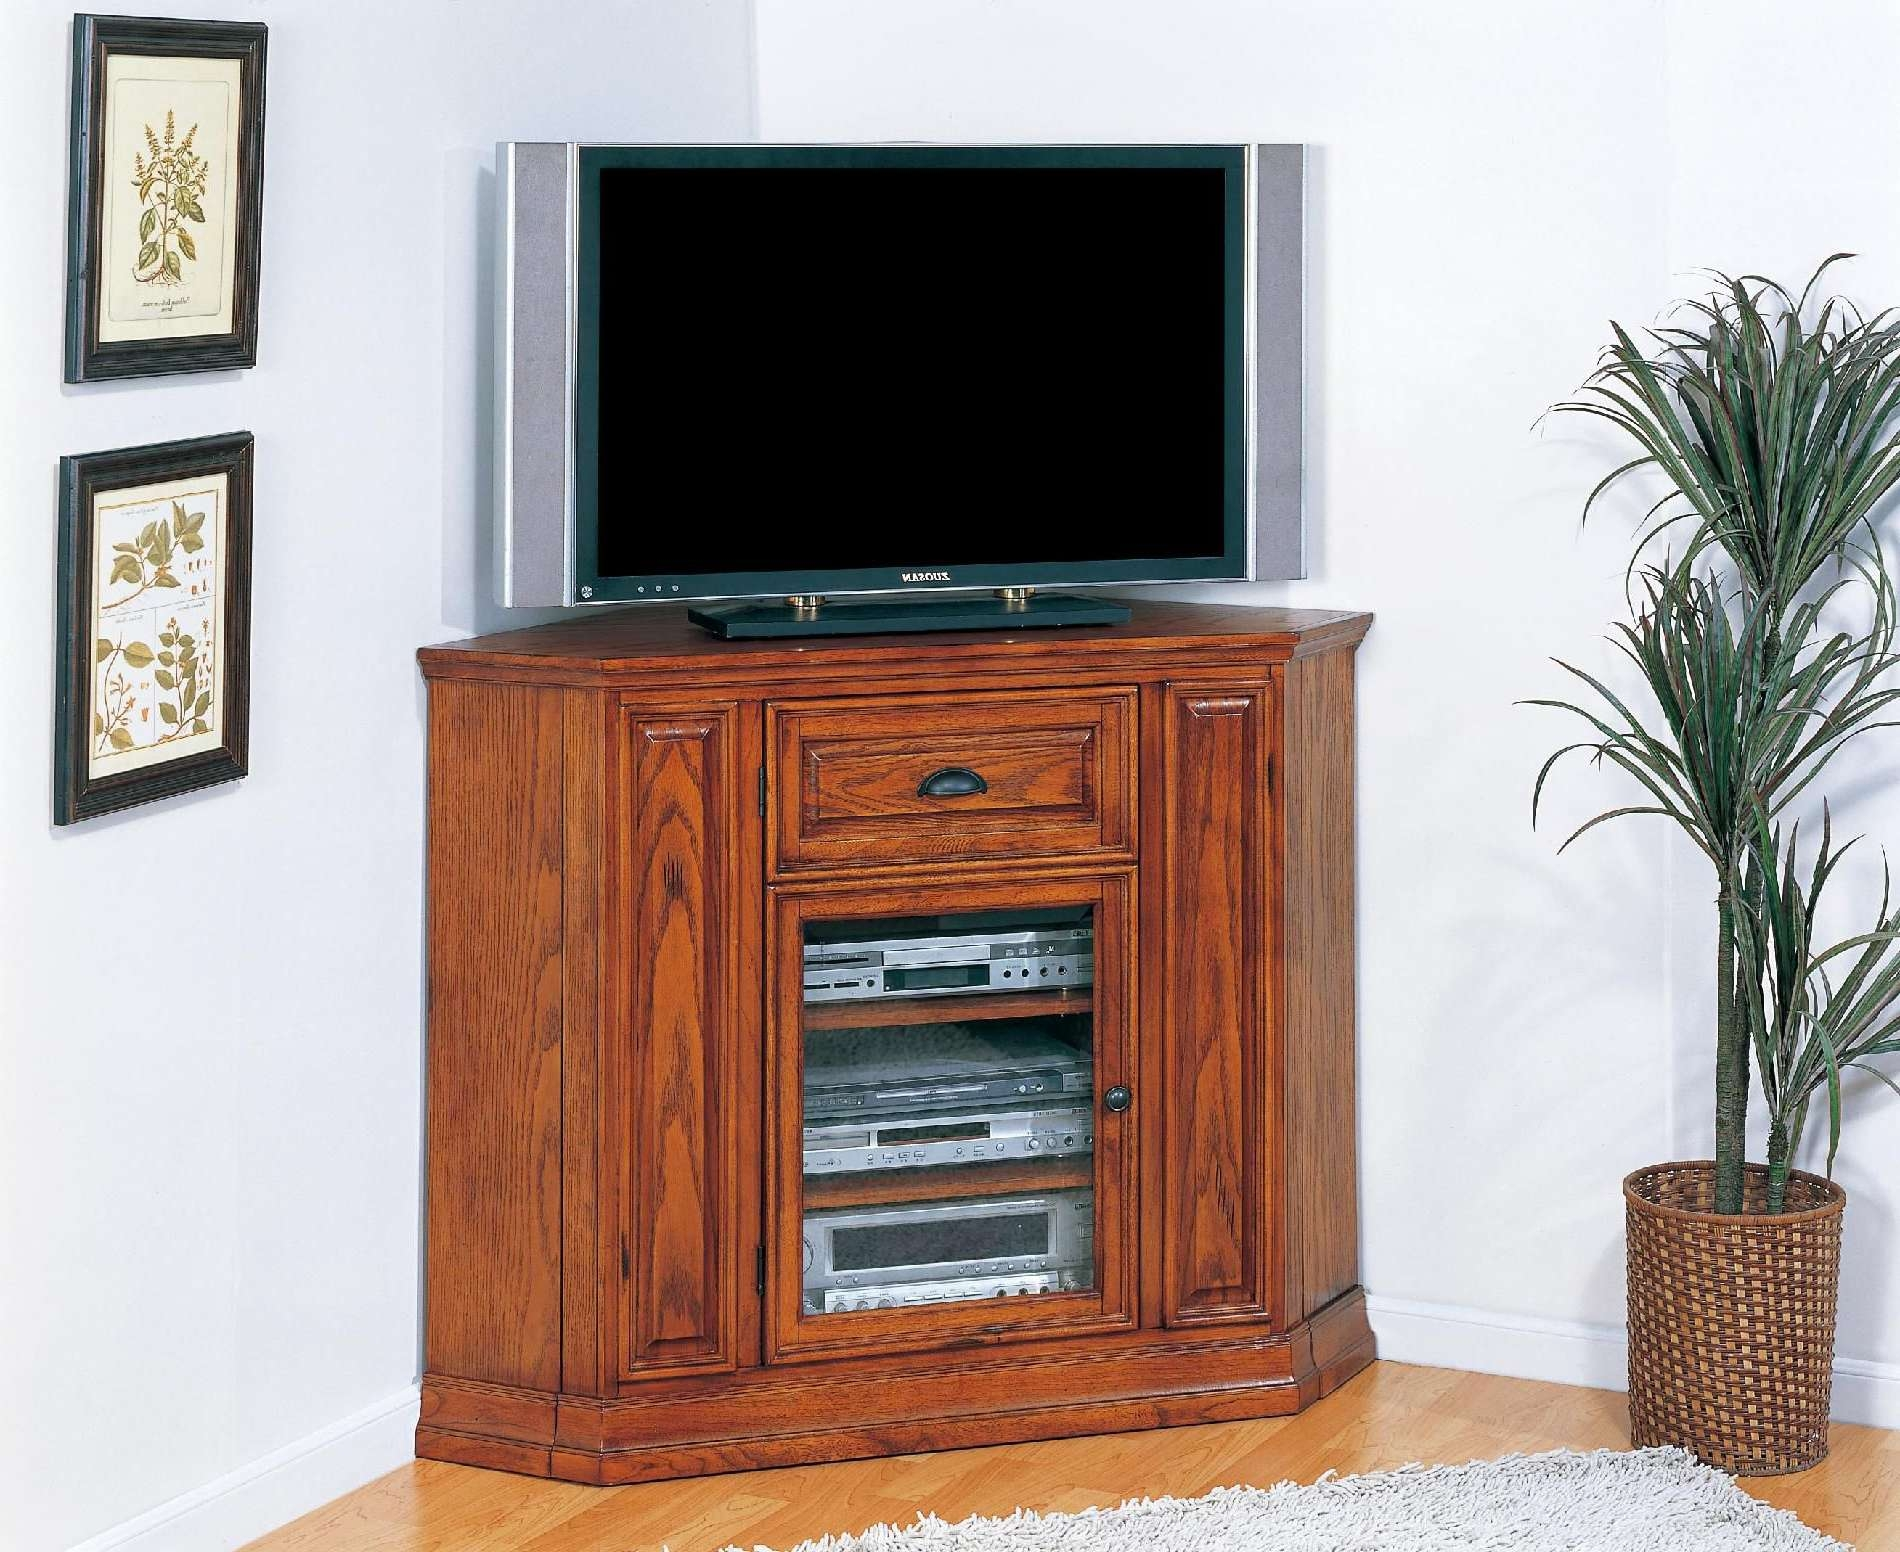 Tall Corner Tv Stand Ikea Walmart Stands For Flat Screens Bedroom Inside Corner Oak Tv Stands For Flat Screen (View 9 of 15)